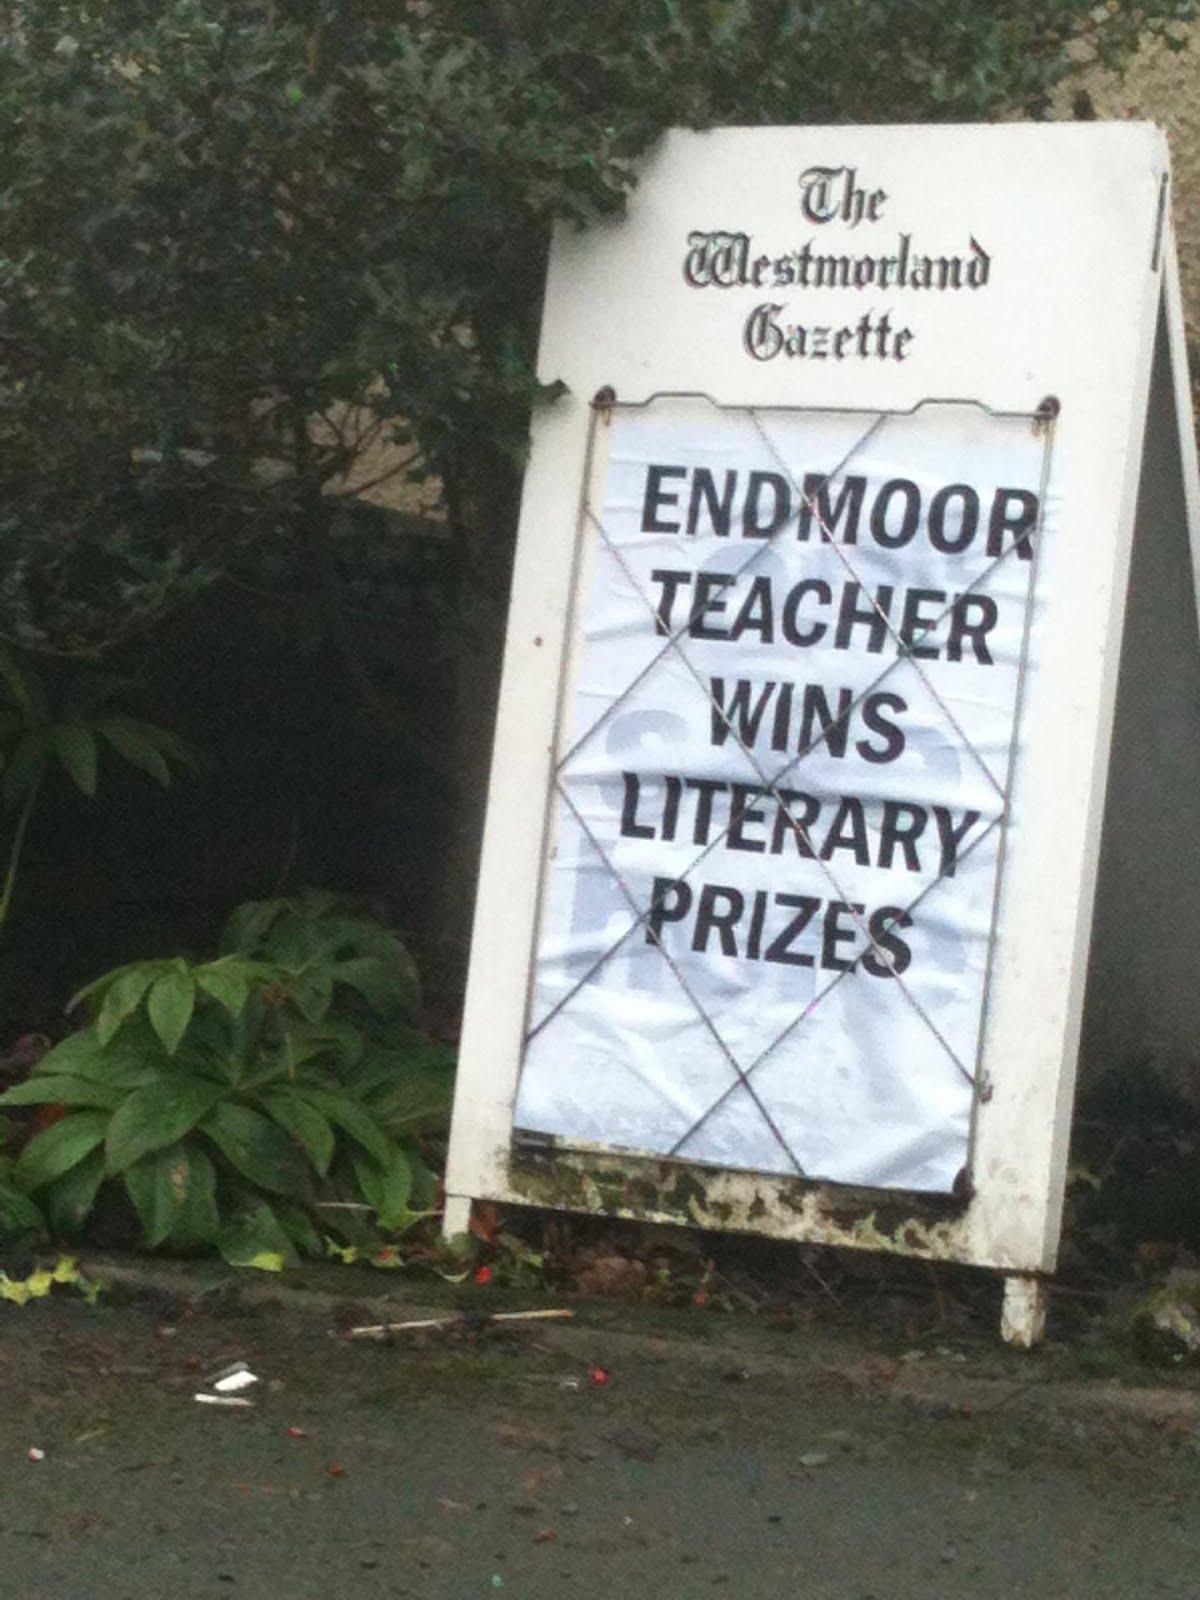 Prize-winner!